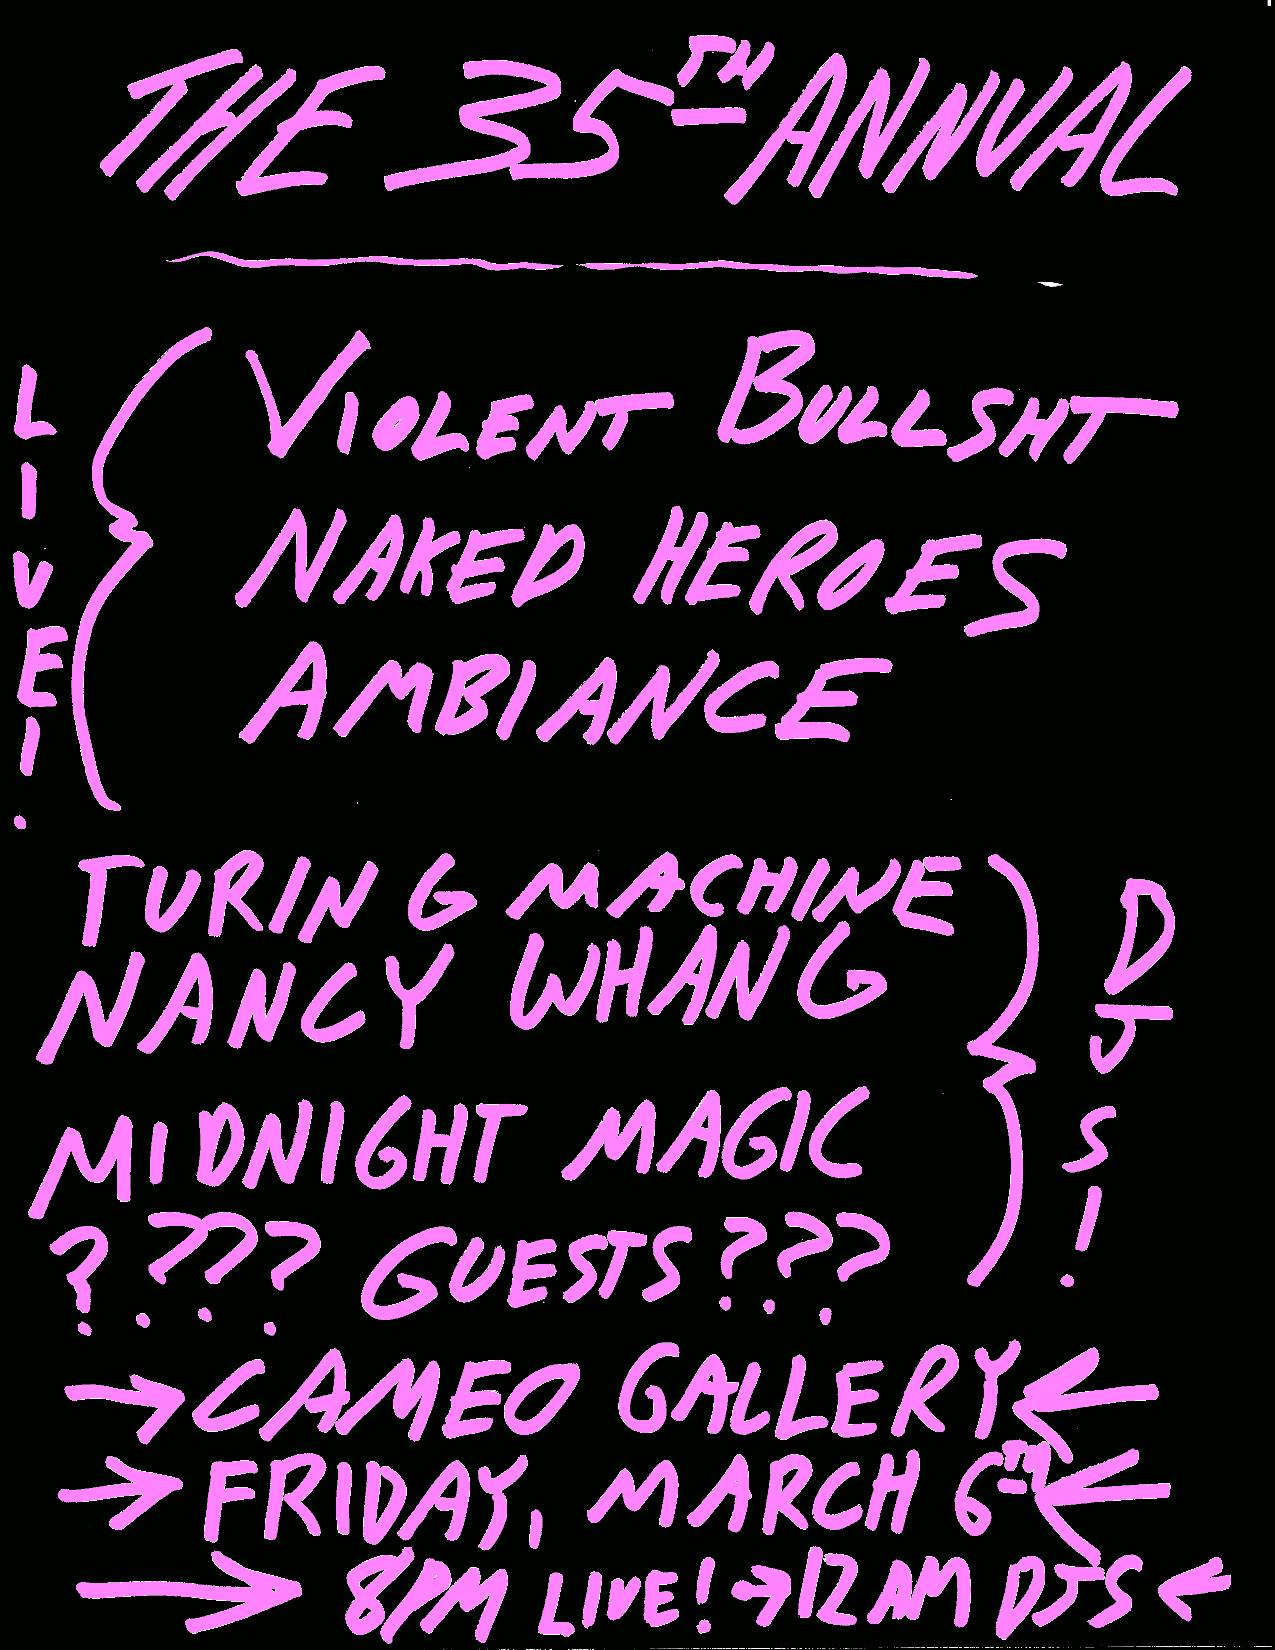 Naked Heroes_Cameo_Violent Bullshit_Nancy Whang